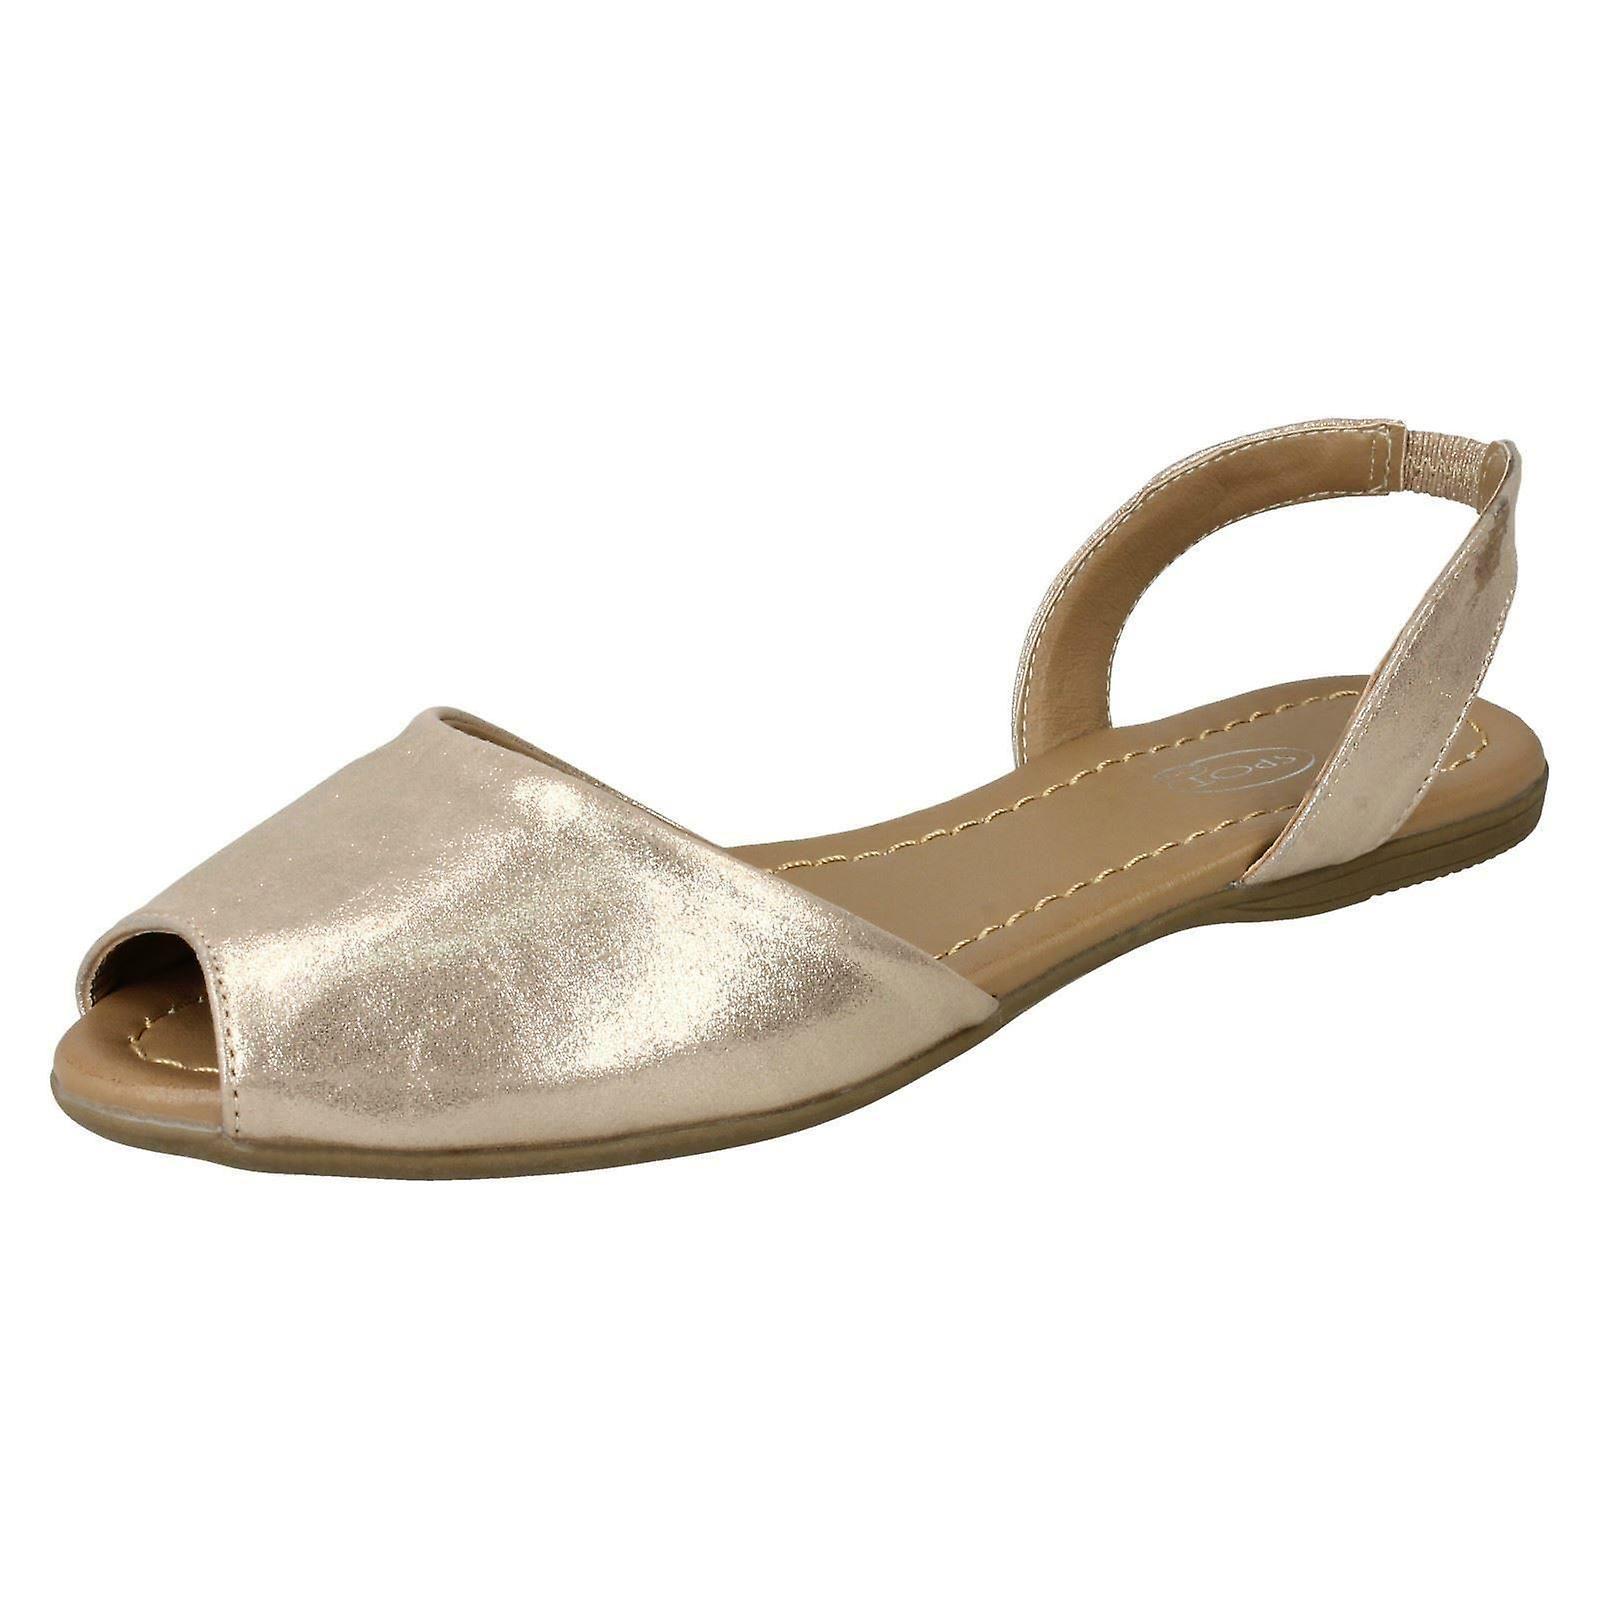 Ladies Spot On Flat Slingback Mule Sandals F00152 - Light Gold Metallic Foil - UK Size 5 - EU Size 38 - US Size 7